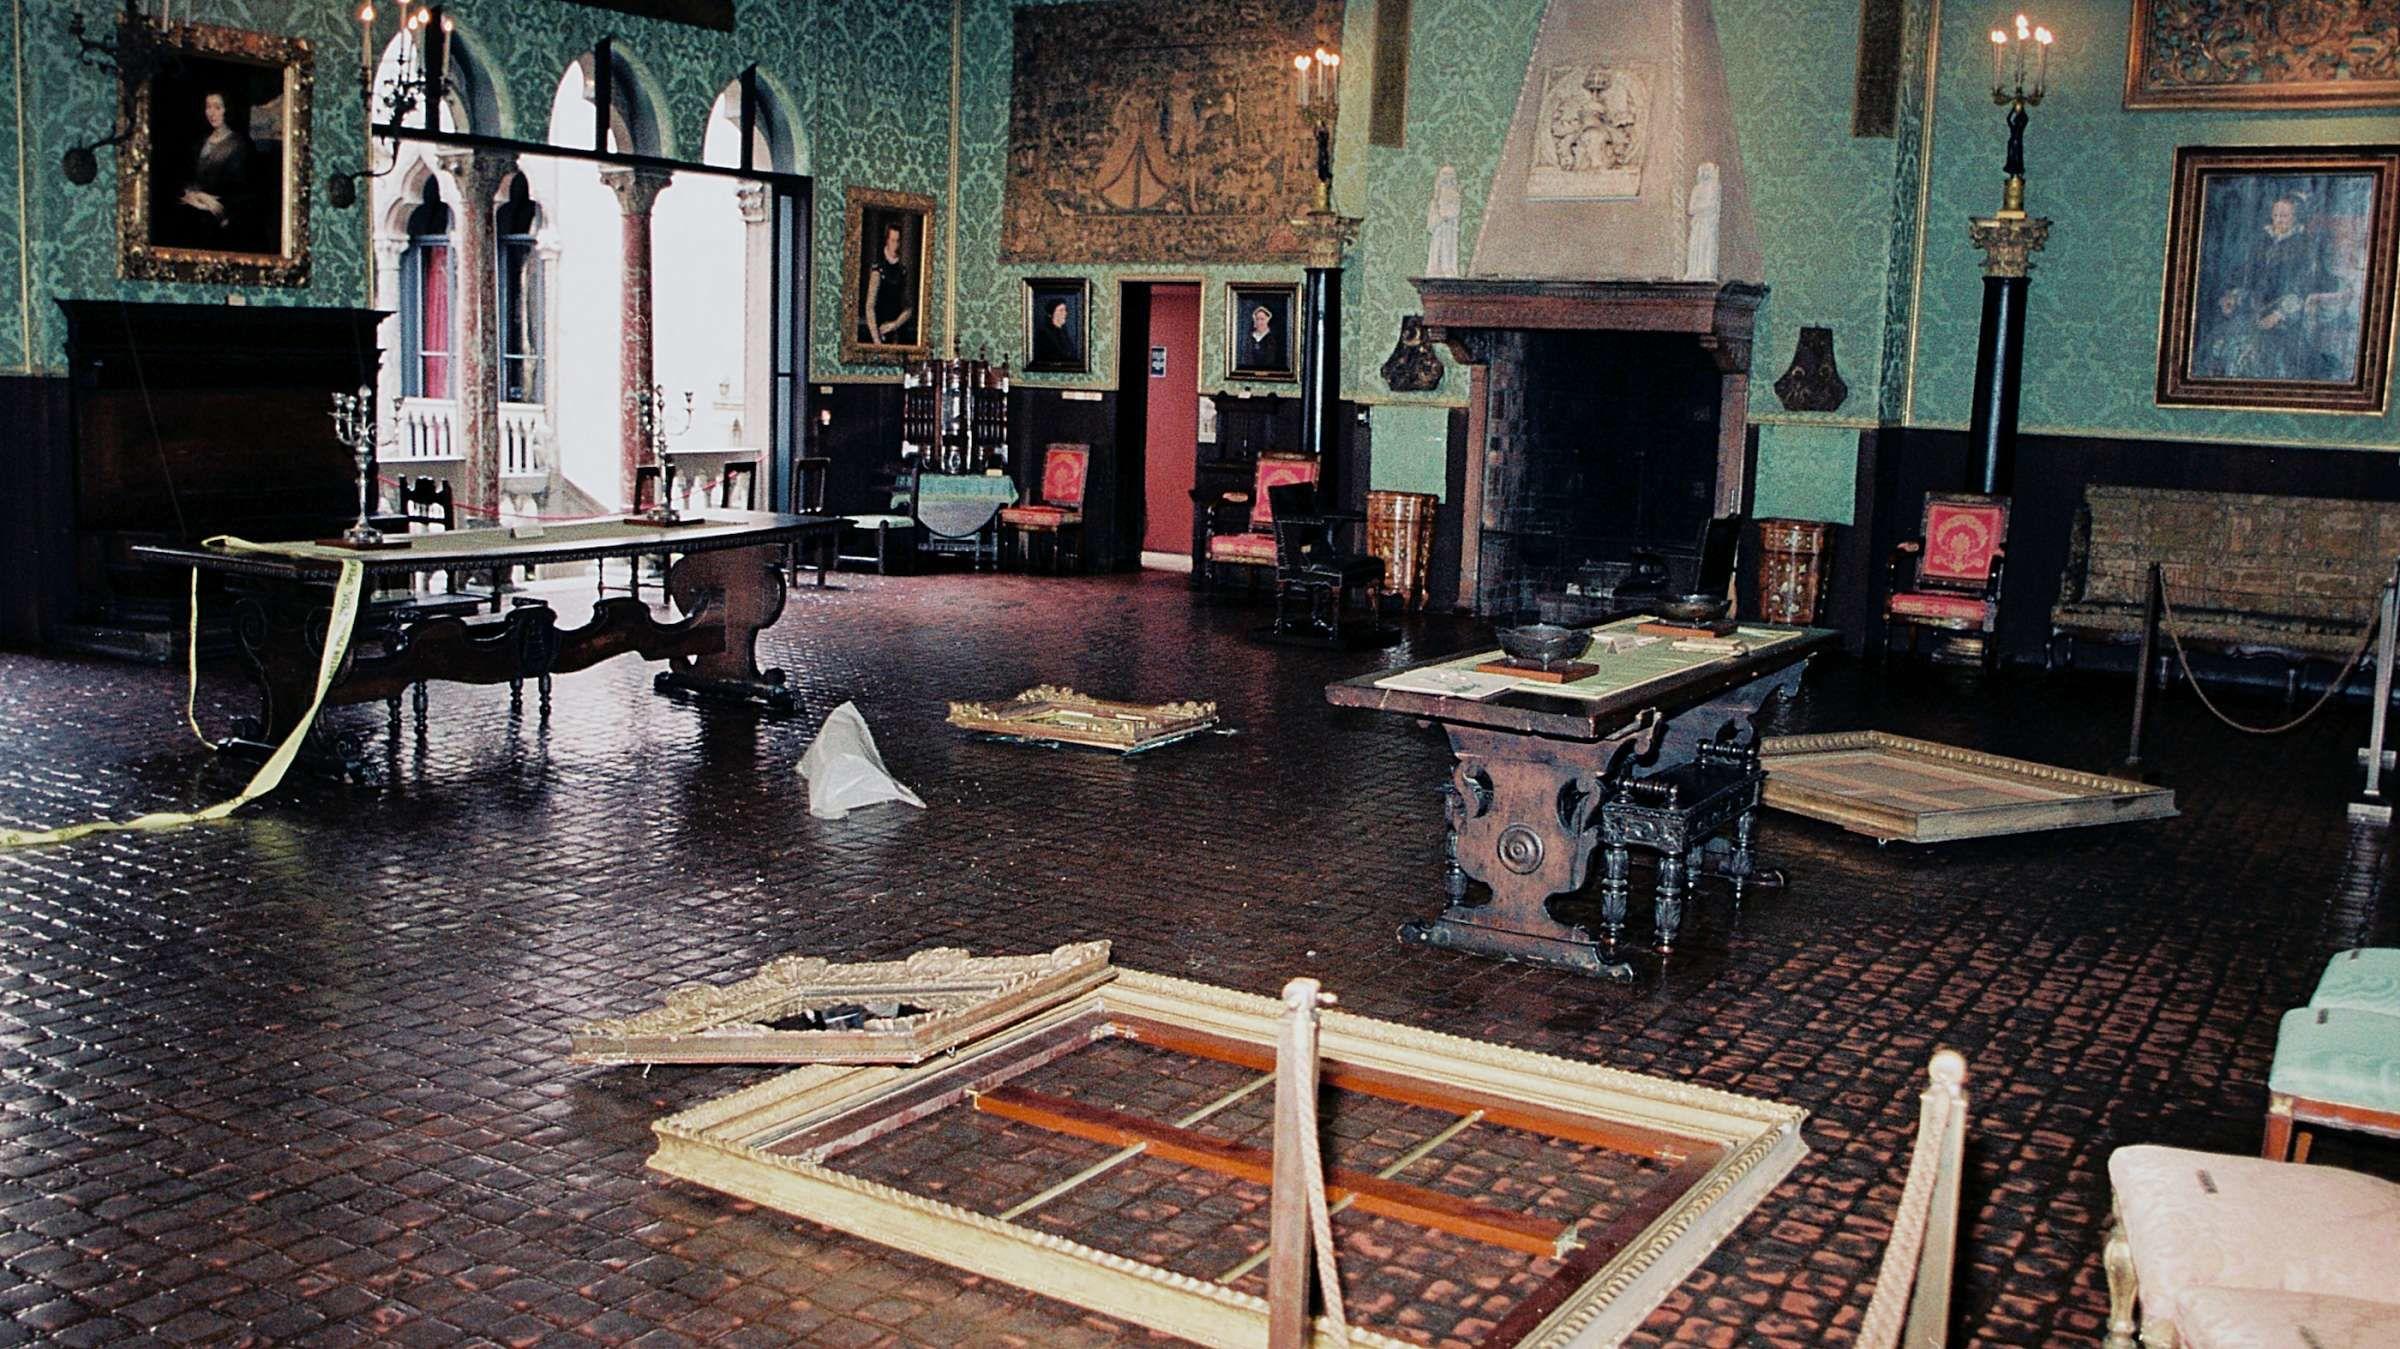 12 Facts About the Isabella Stewart Gardner Museum Robbery—the World's Biggest Art Heist